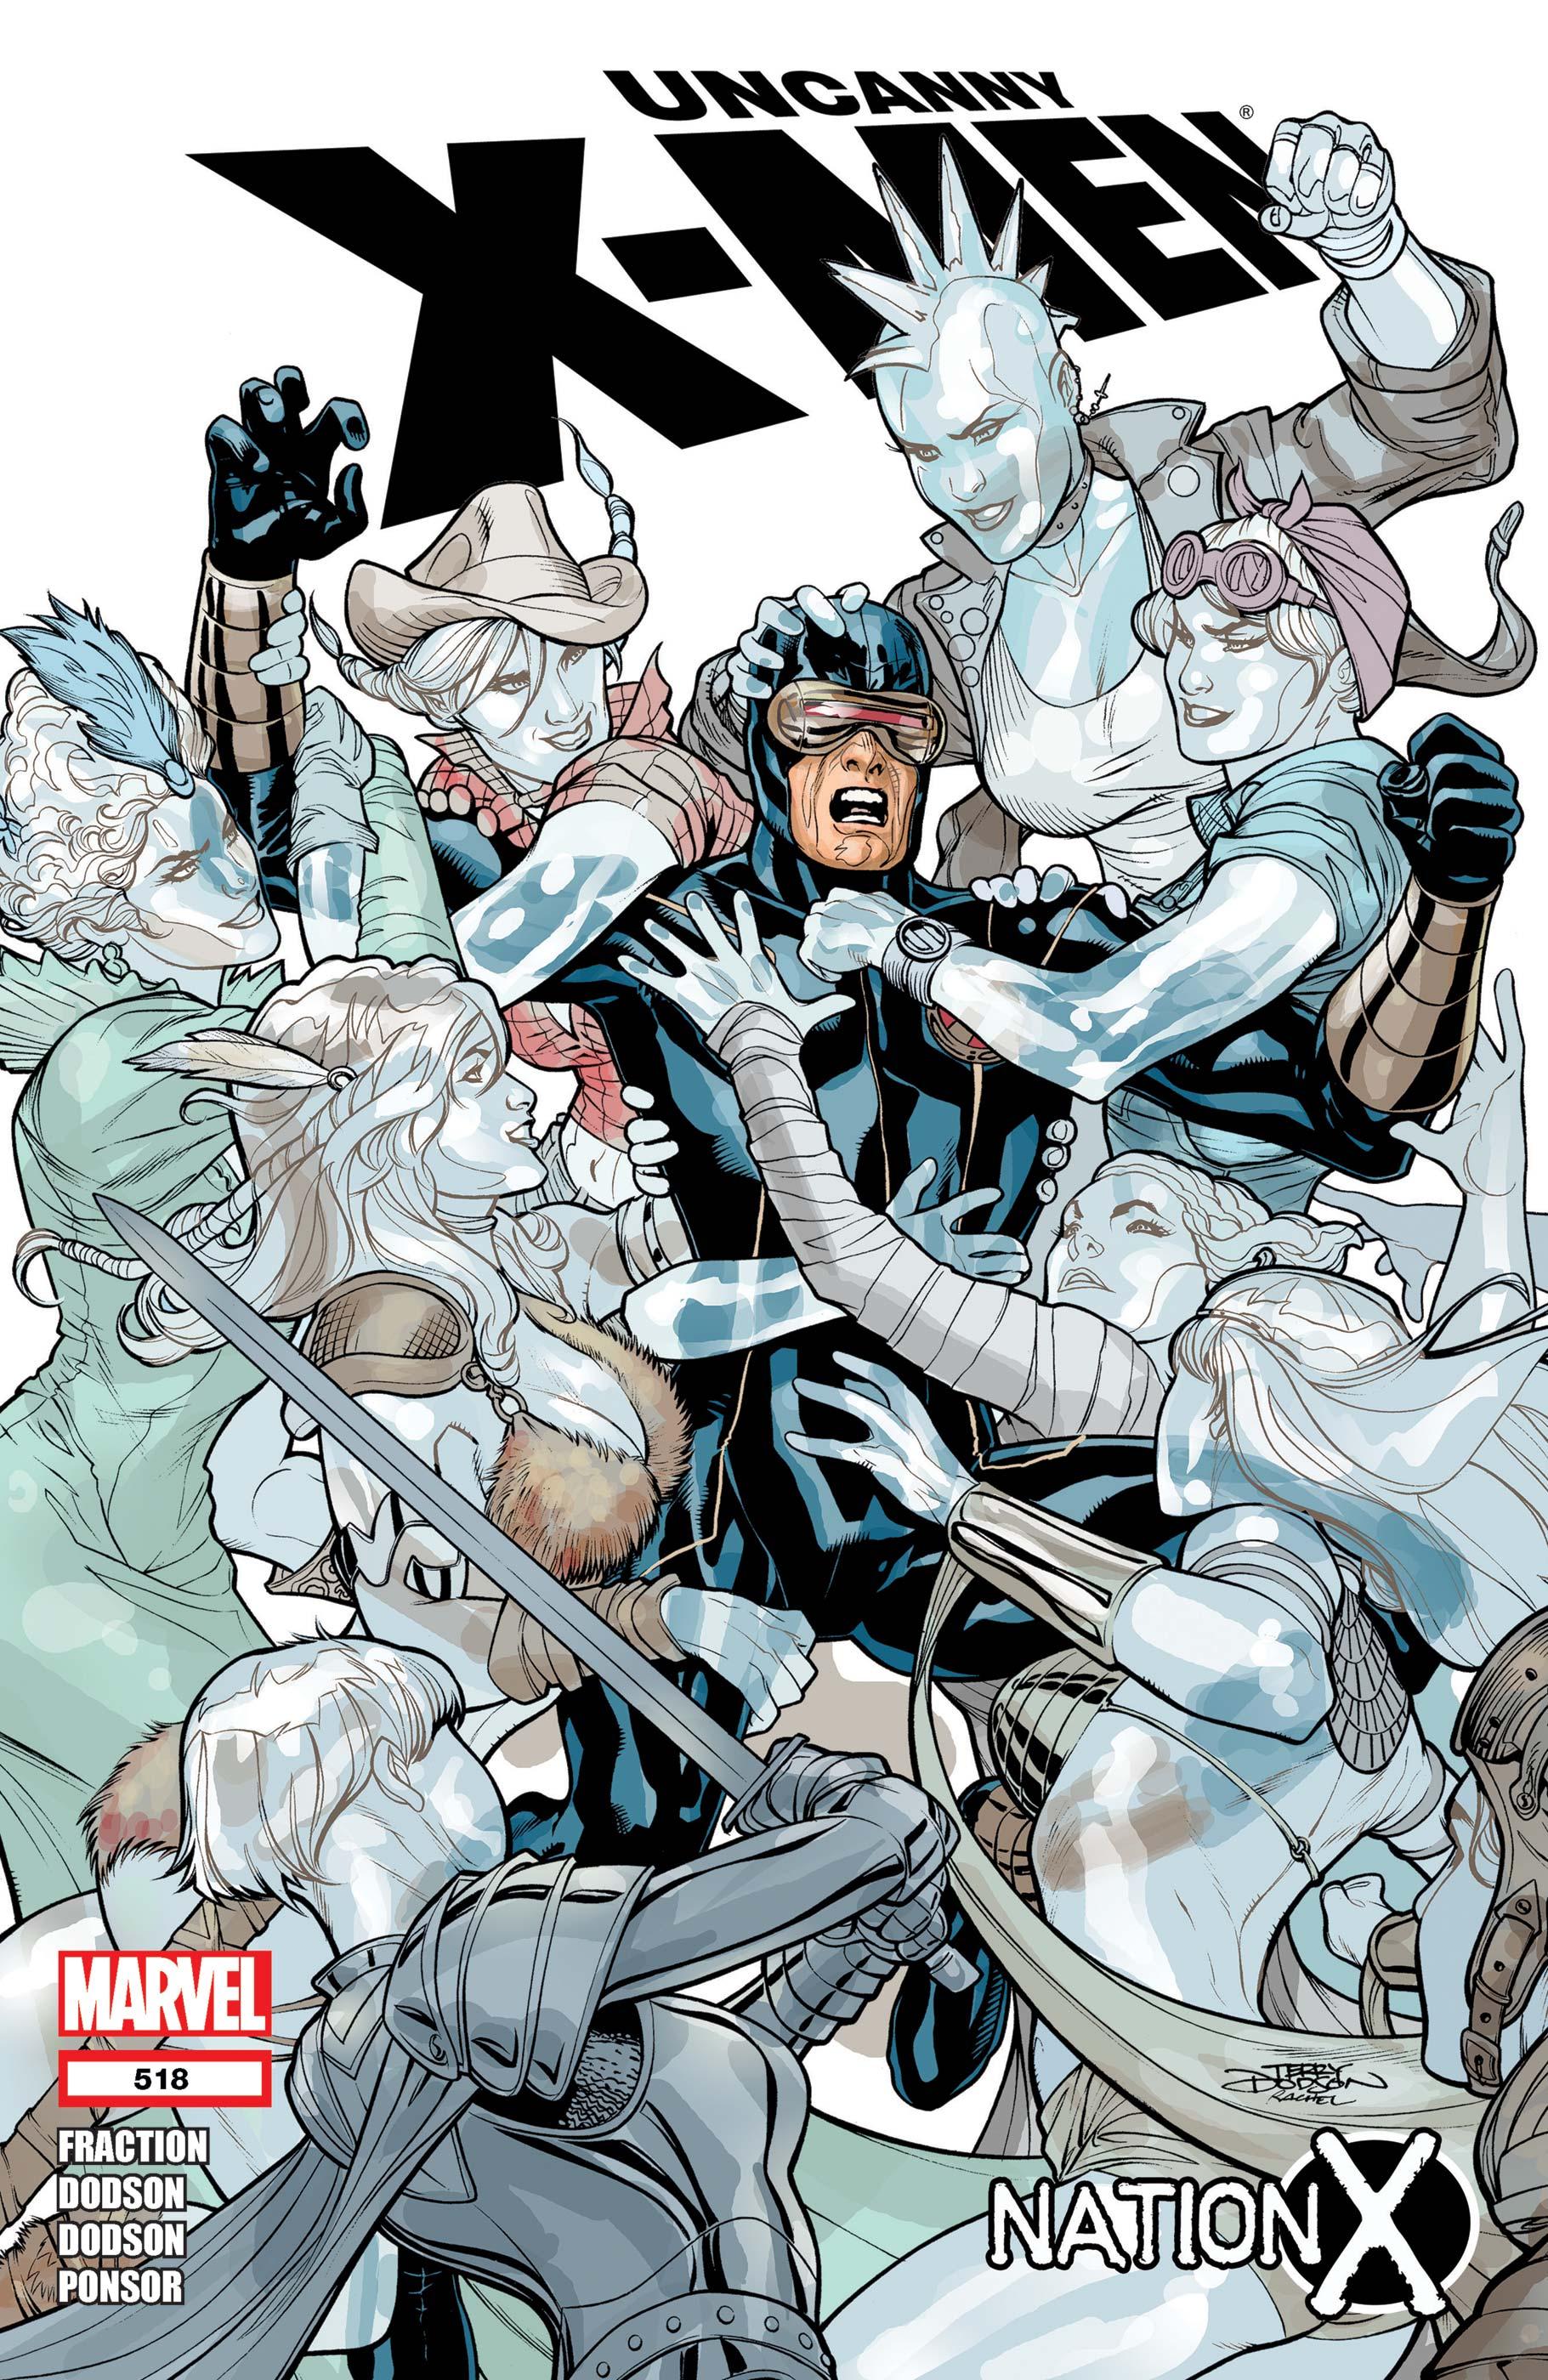 Uncanny X-Men (1963) #518